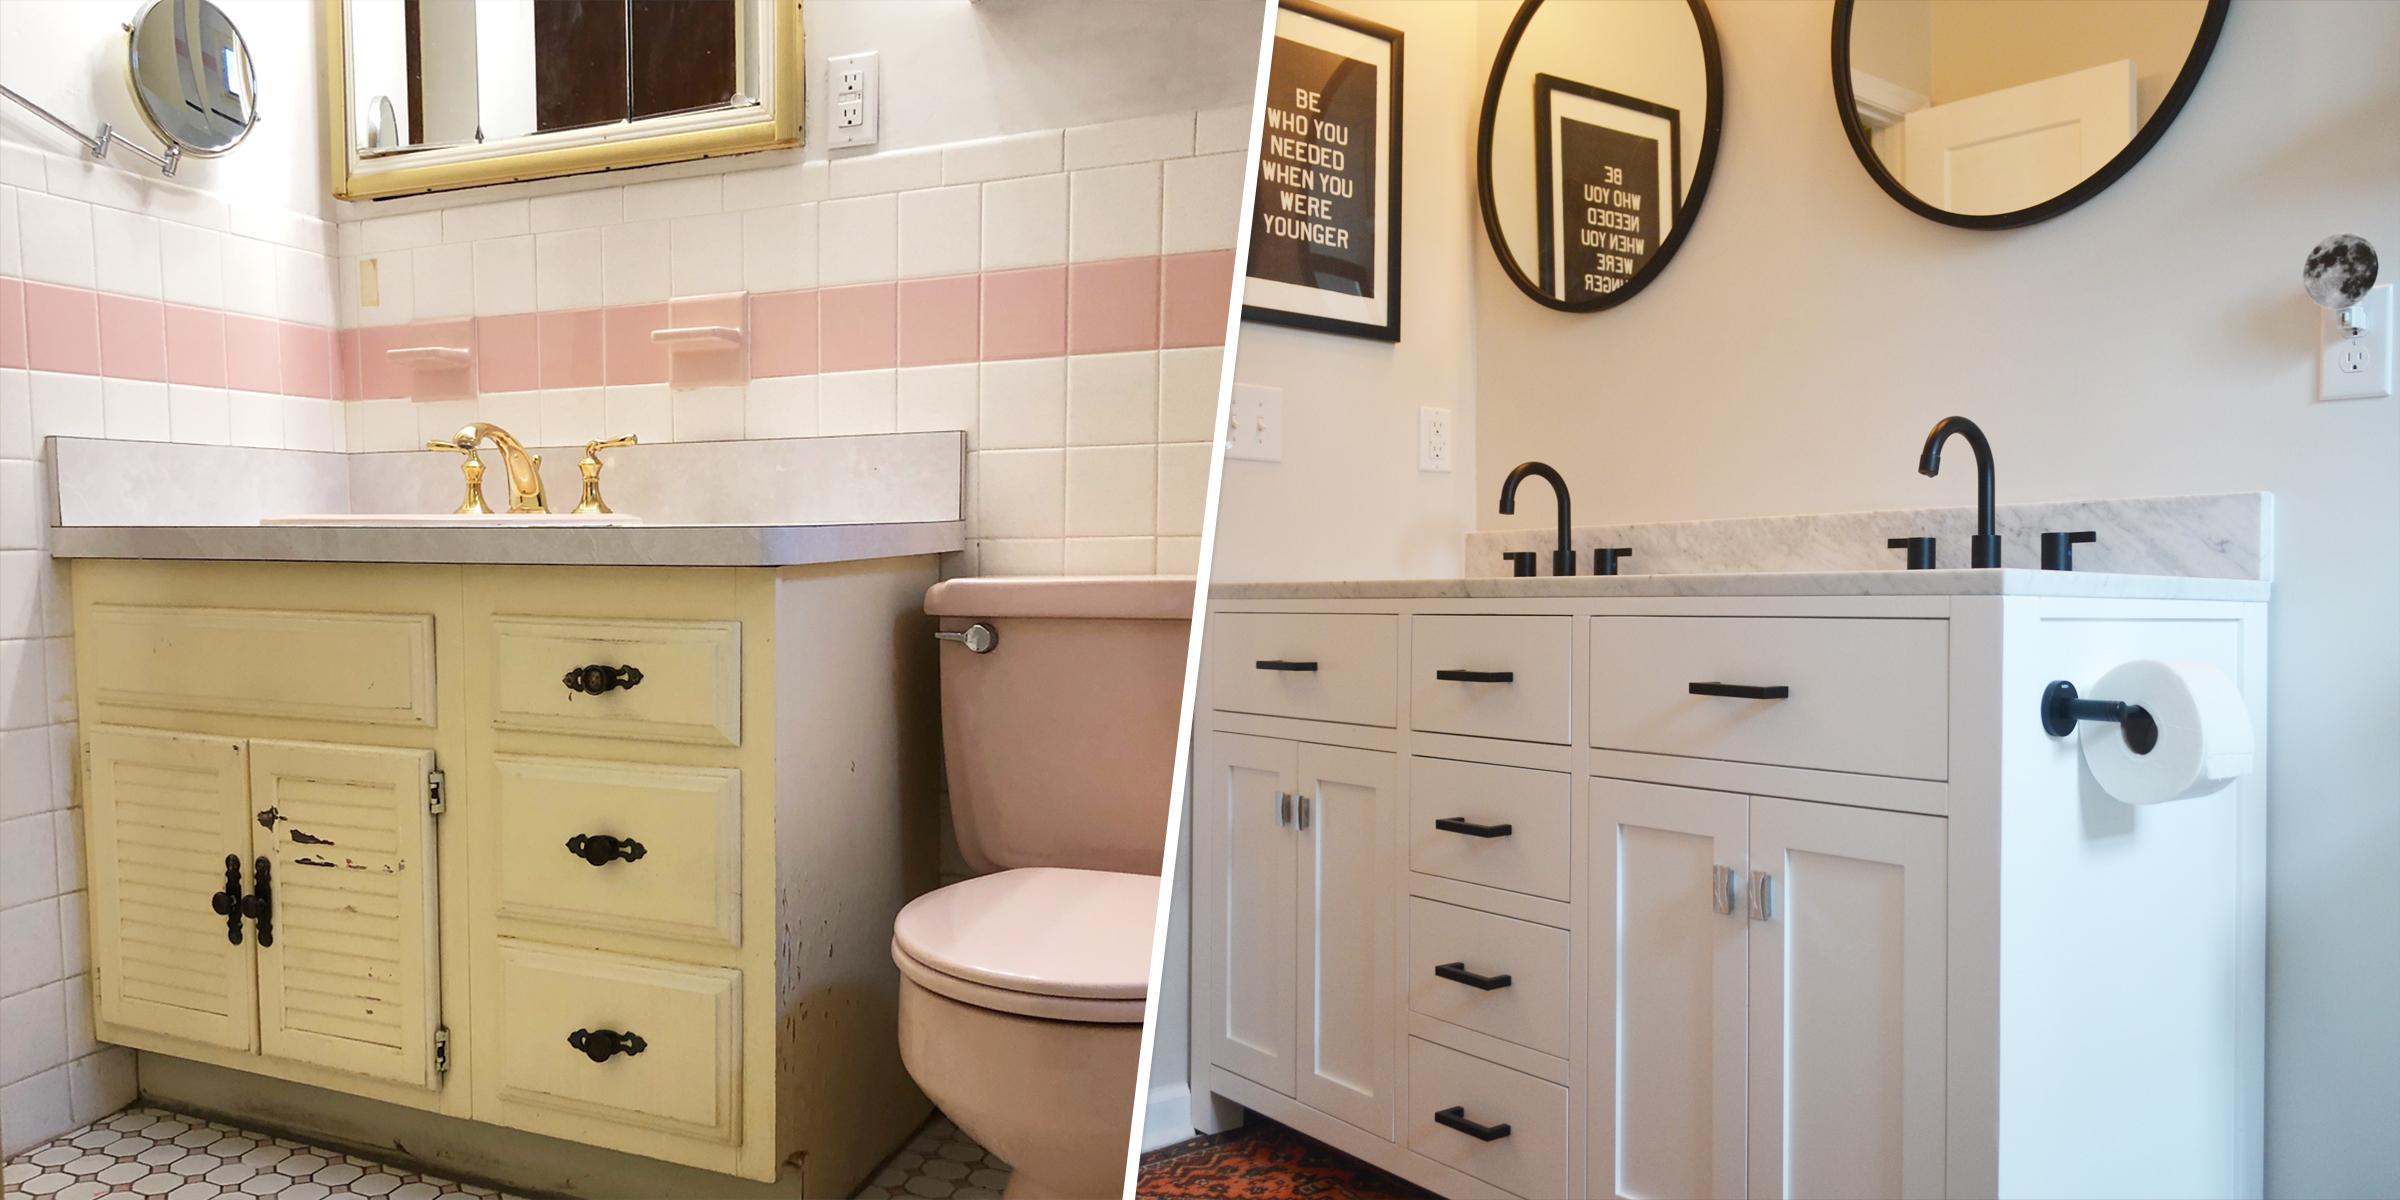 How To Diy A Bathroom Renovation During Coronavirus